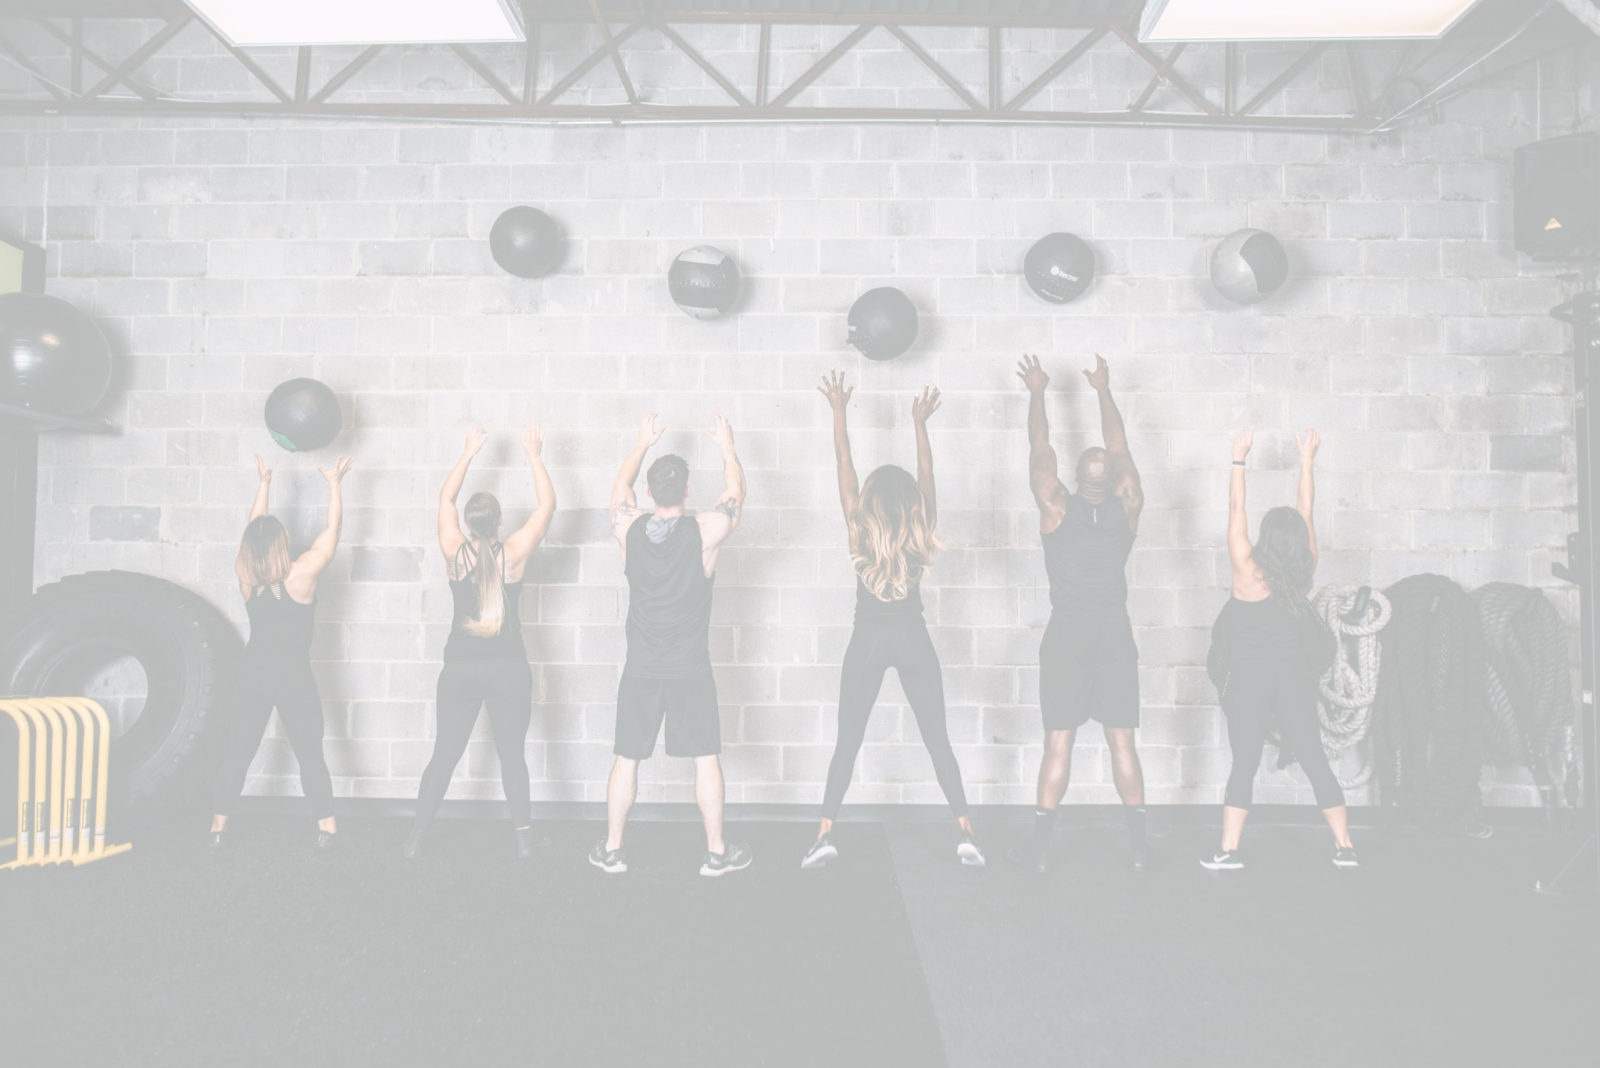 Iron Way Training - image Wall-Ball-5 on https://ironforgedfitness.com